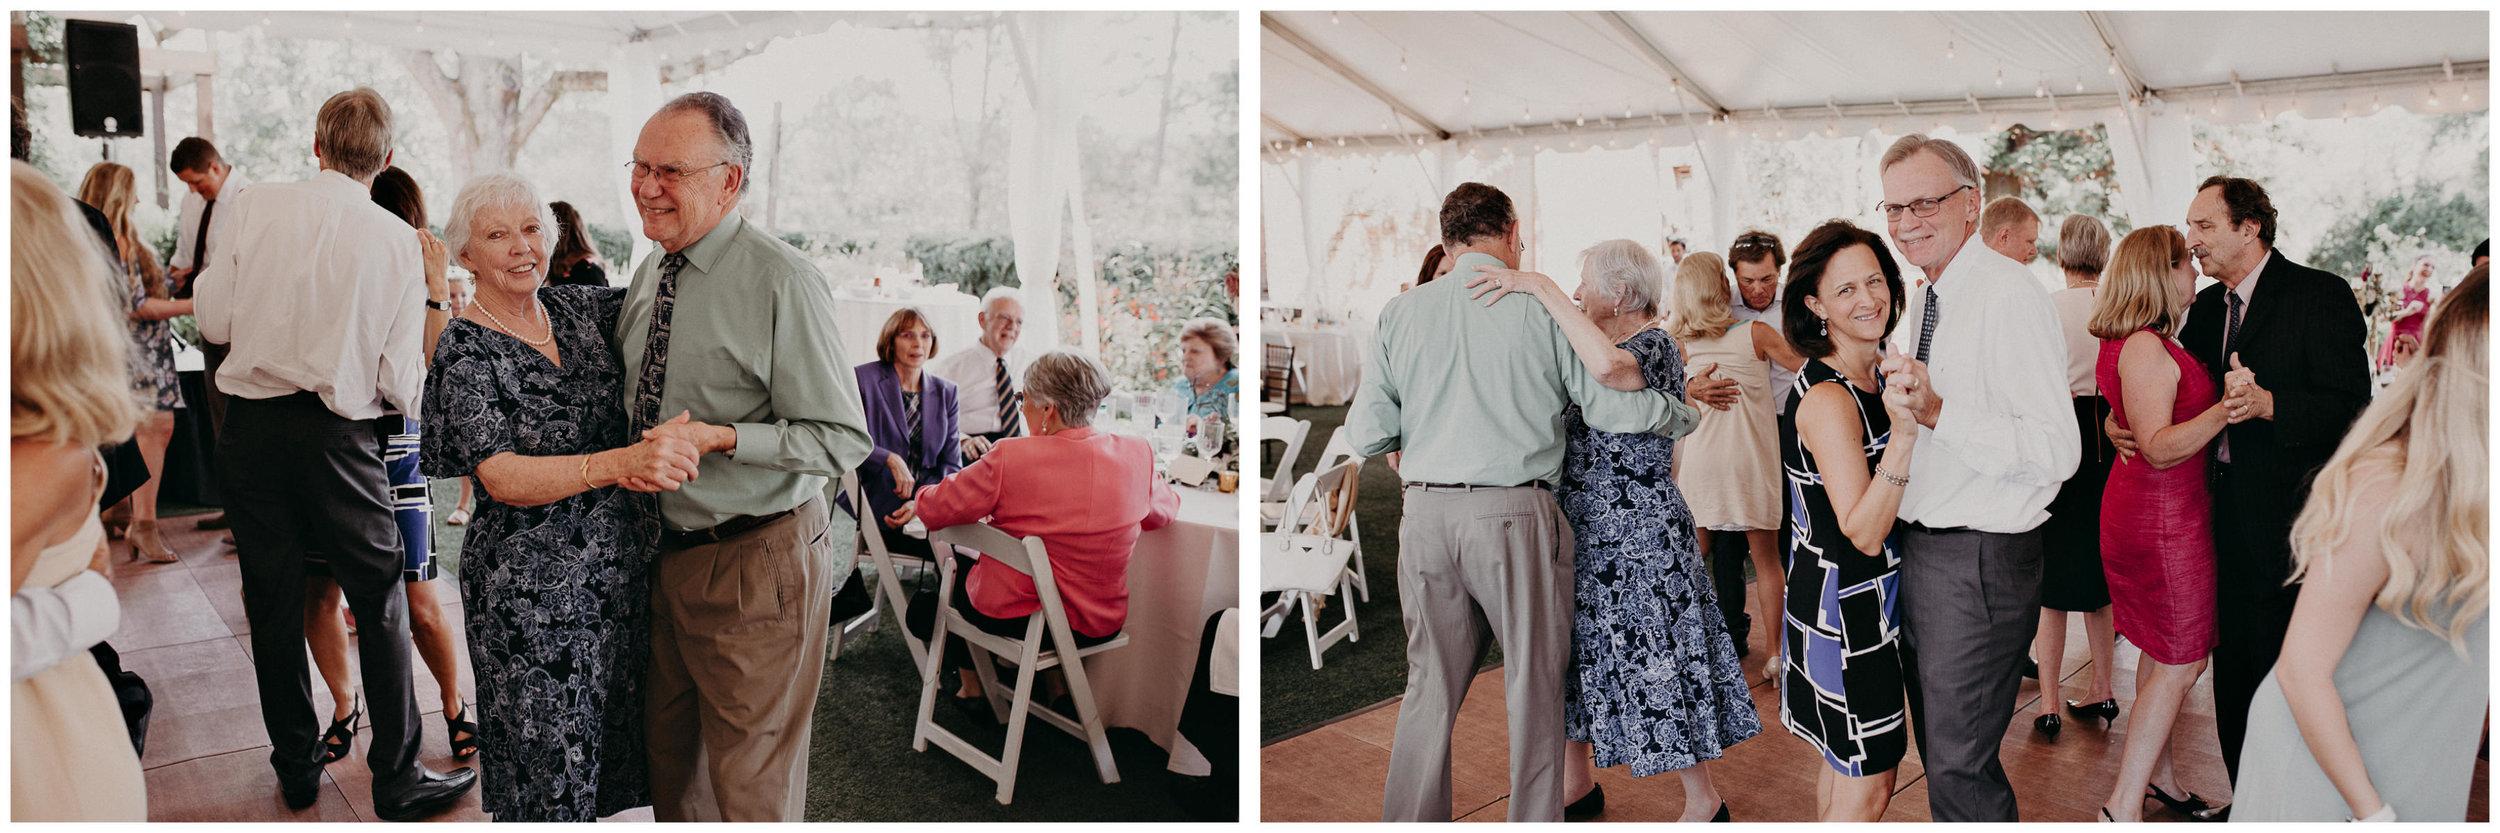 134 - Barnsley Gardens Wedding -Bride and groom portraits - Atlanta wedding photographer .jpg